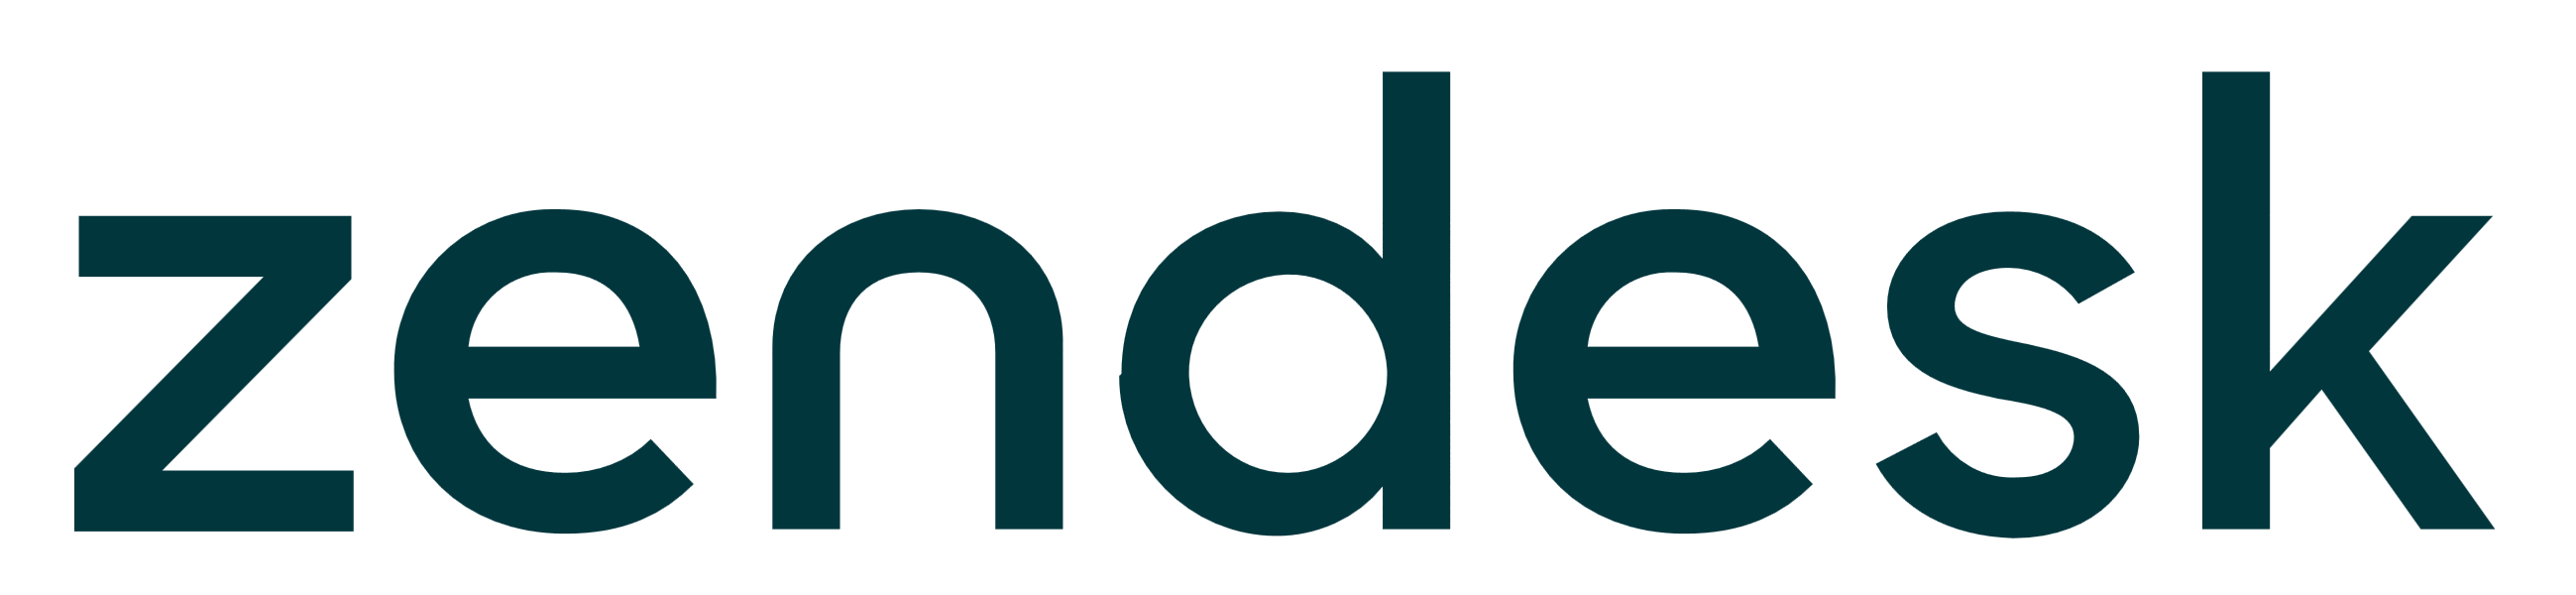 Zendesk – Colour